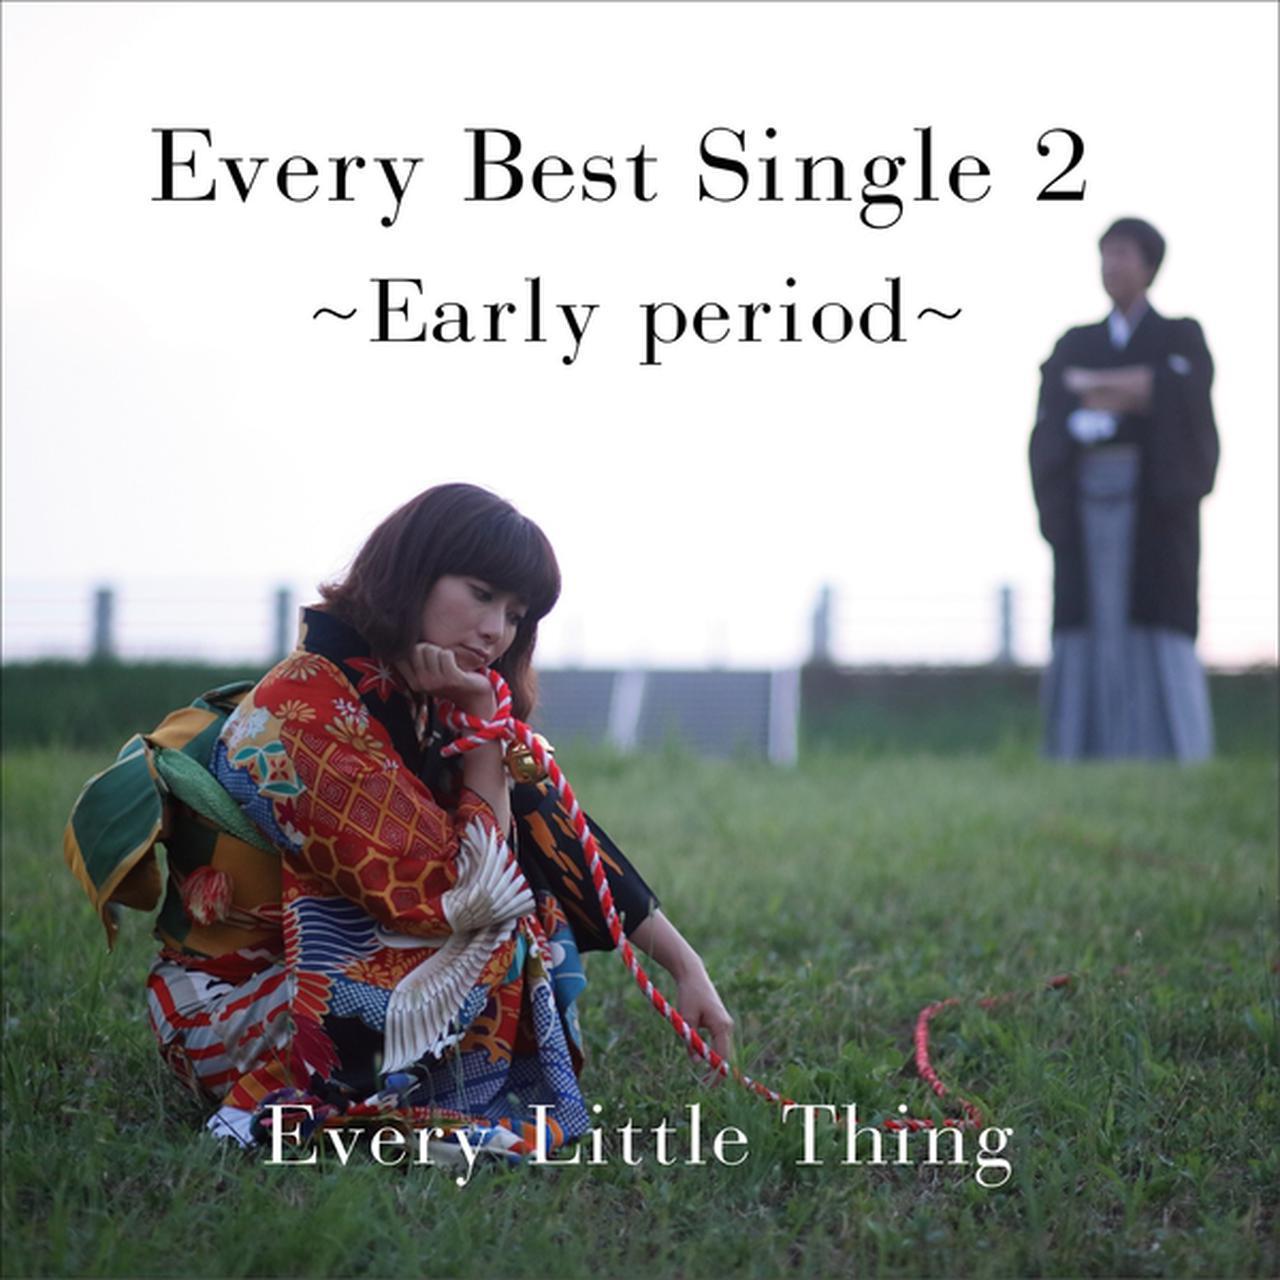 画像: Every Best Single 2 ~Early period~ / Every Little Thing